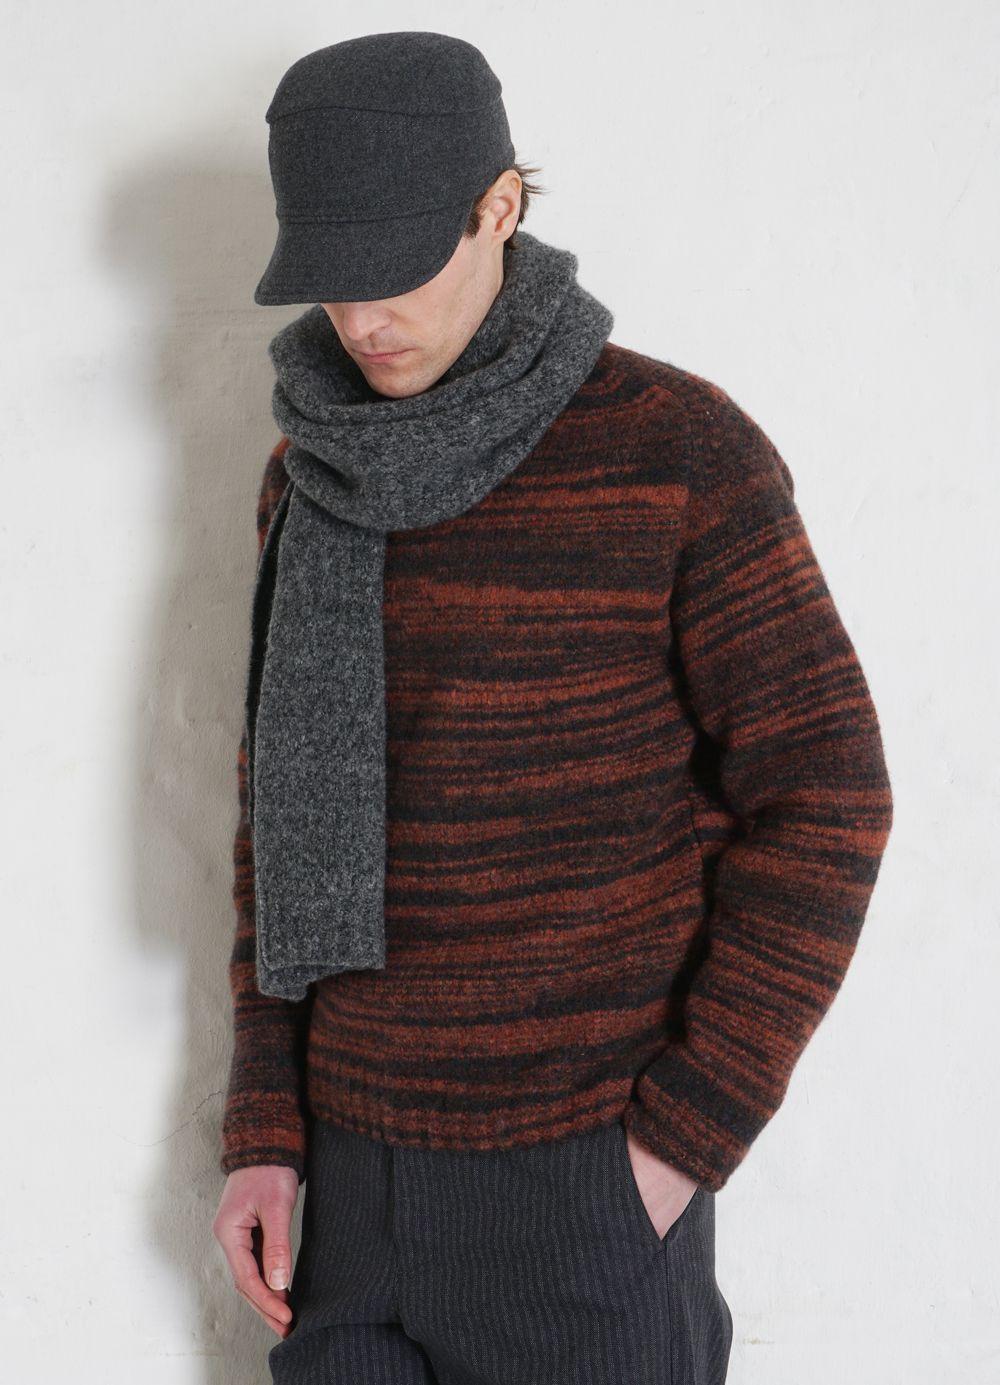 Hansen Garments ESKILD   Mechanics Cap With Earflaps   grey melange, navy